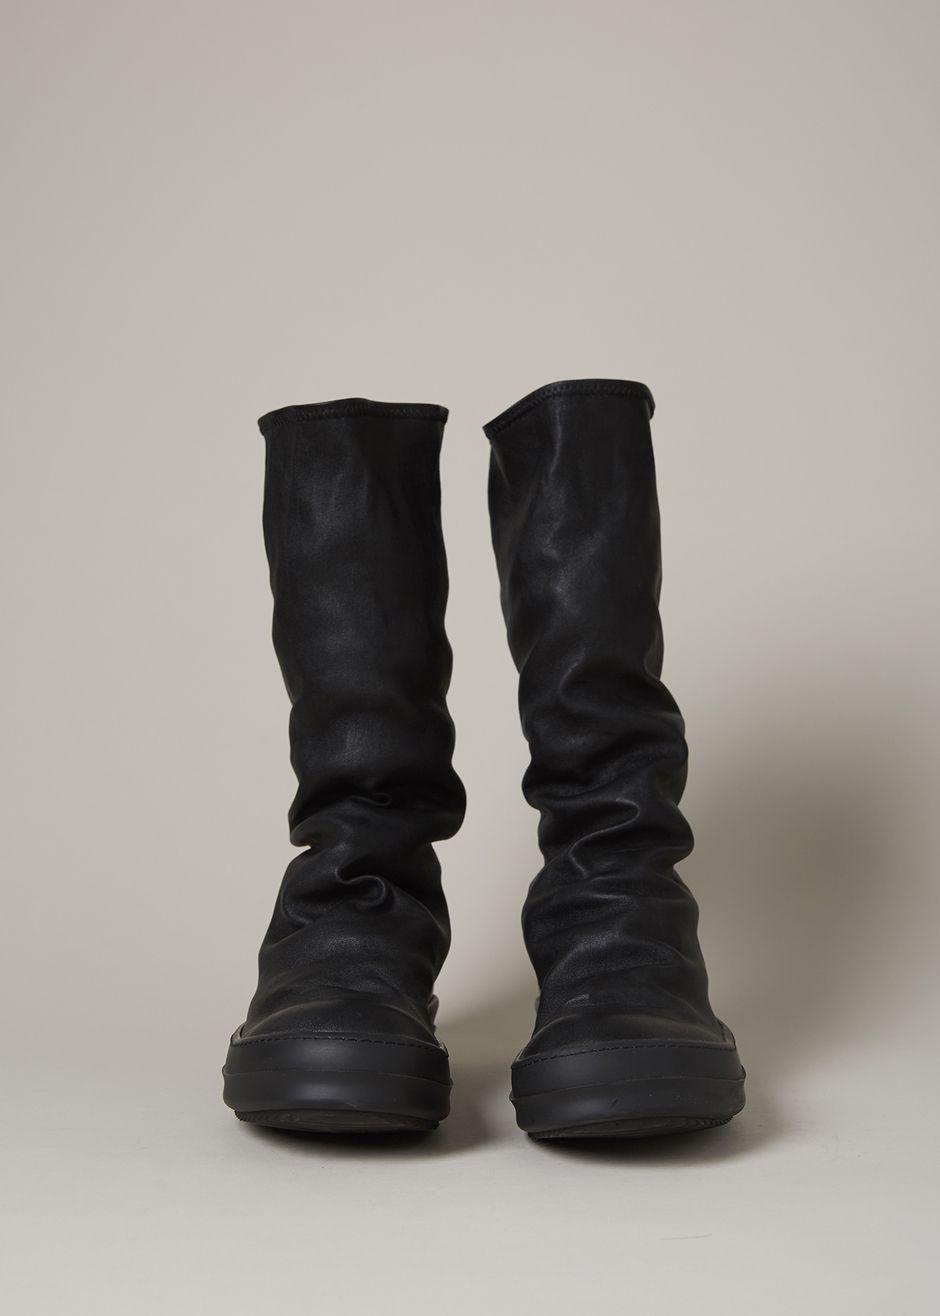 Stocking sneakers - Black Rick Owens fZ0Yir5oXJ